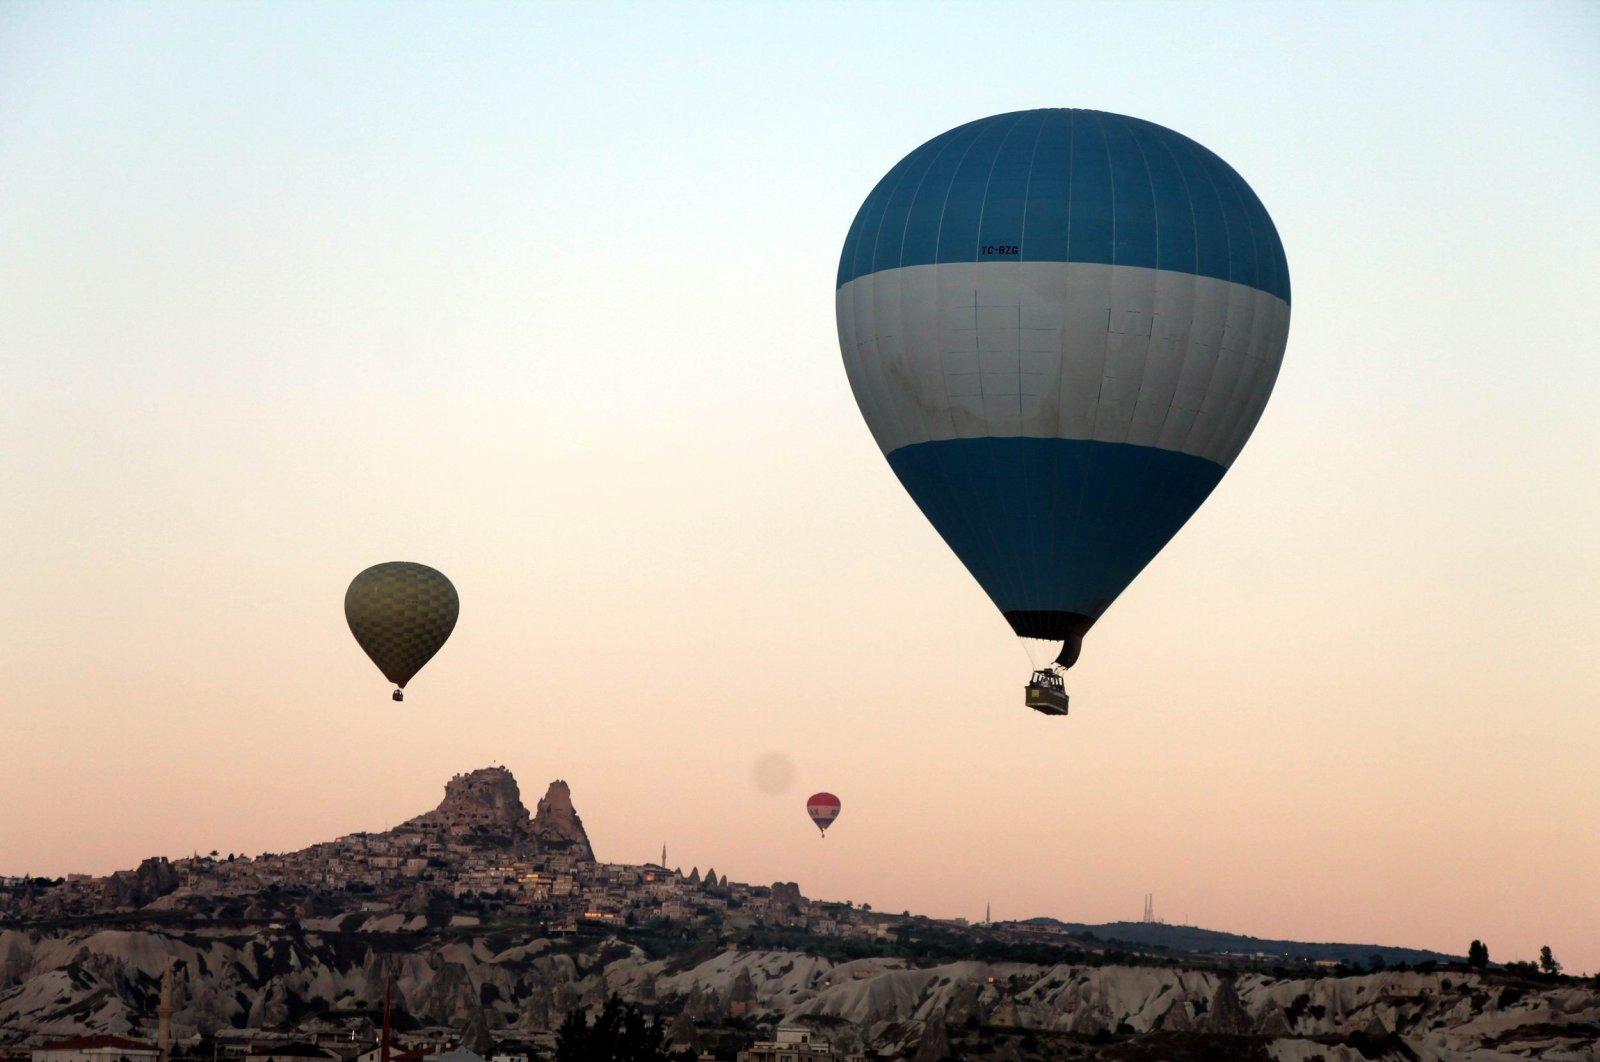 Hot air balloons rise one by one over the skies of Cappadocia region, Nevşehir, central Turkey, June 10, 2021. (IHA Photo)